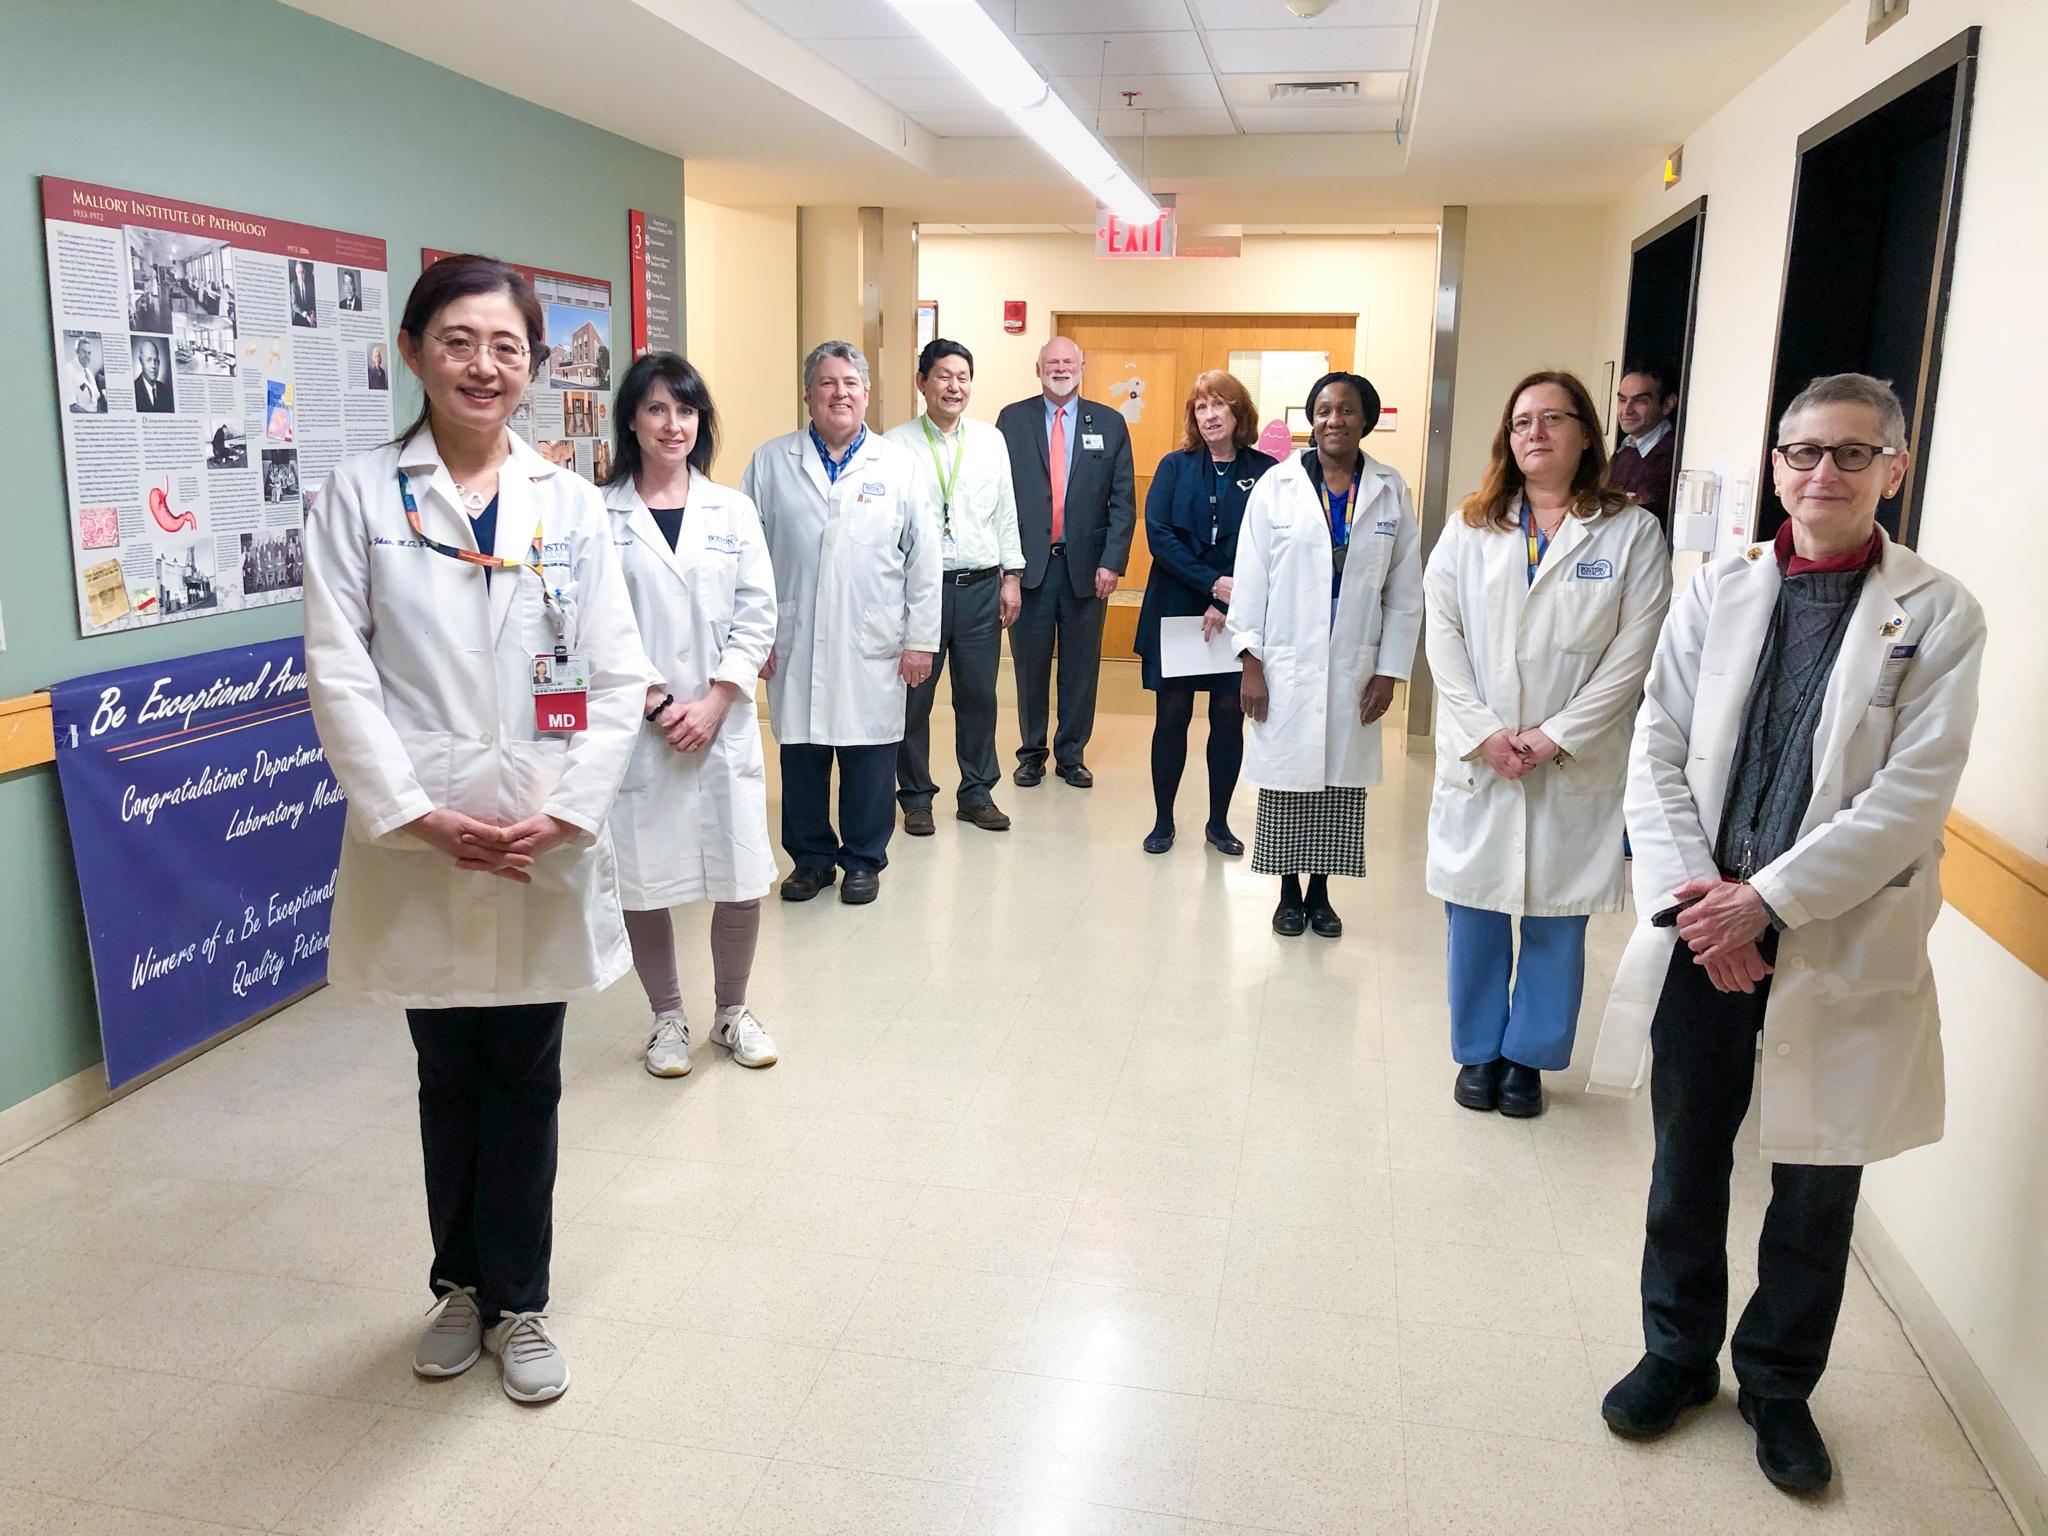 Representatives of the BMC Pathology and Laboratory Medicine Cov-2 Team